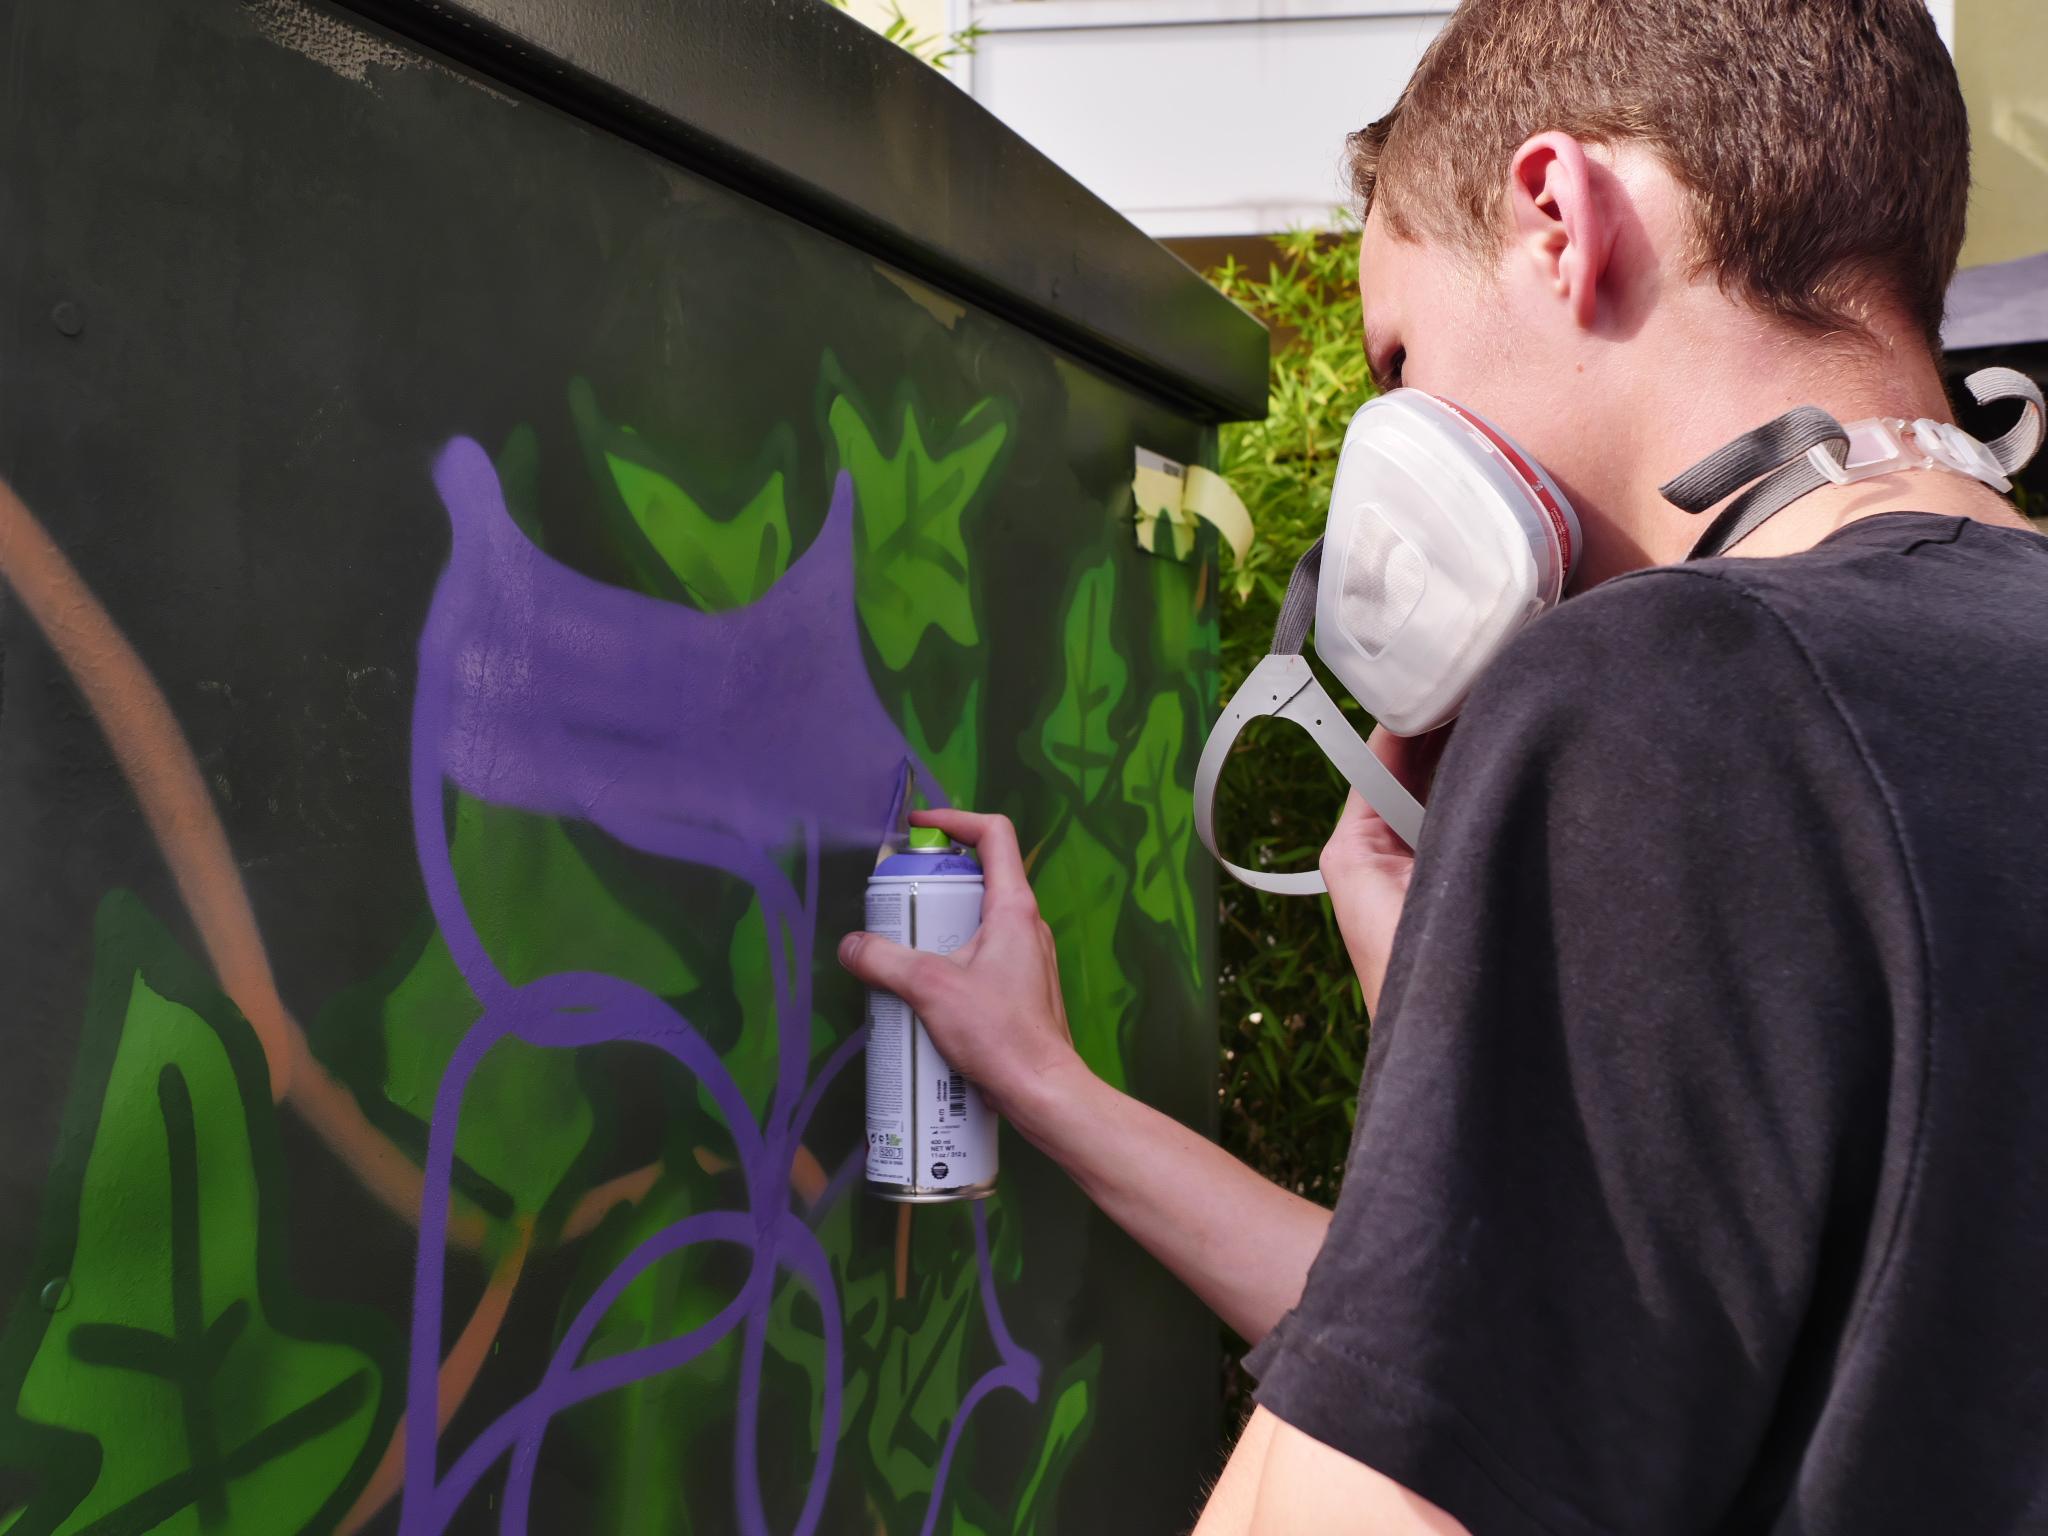 jugendkulturjahr-2020-ratingen-jkj2020-graffiti-trafohaeuschen-stadtwerke-Bild20